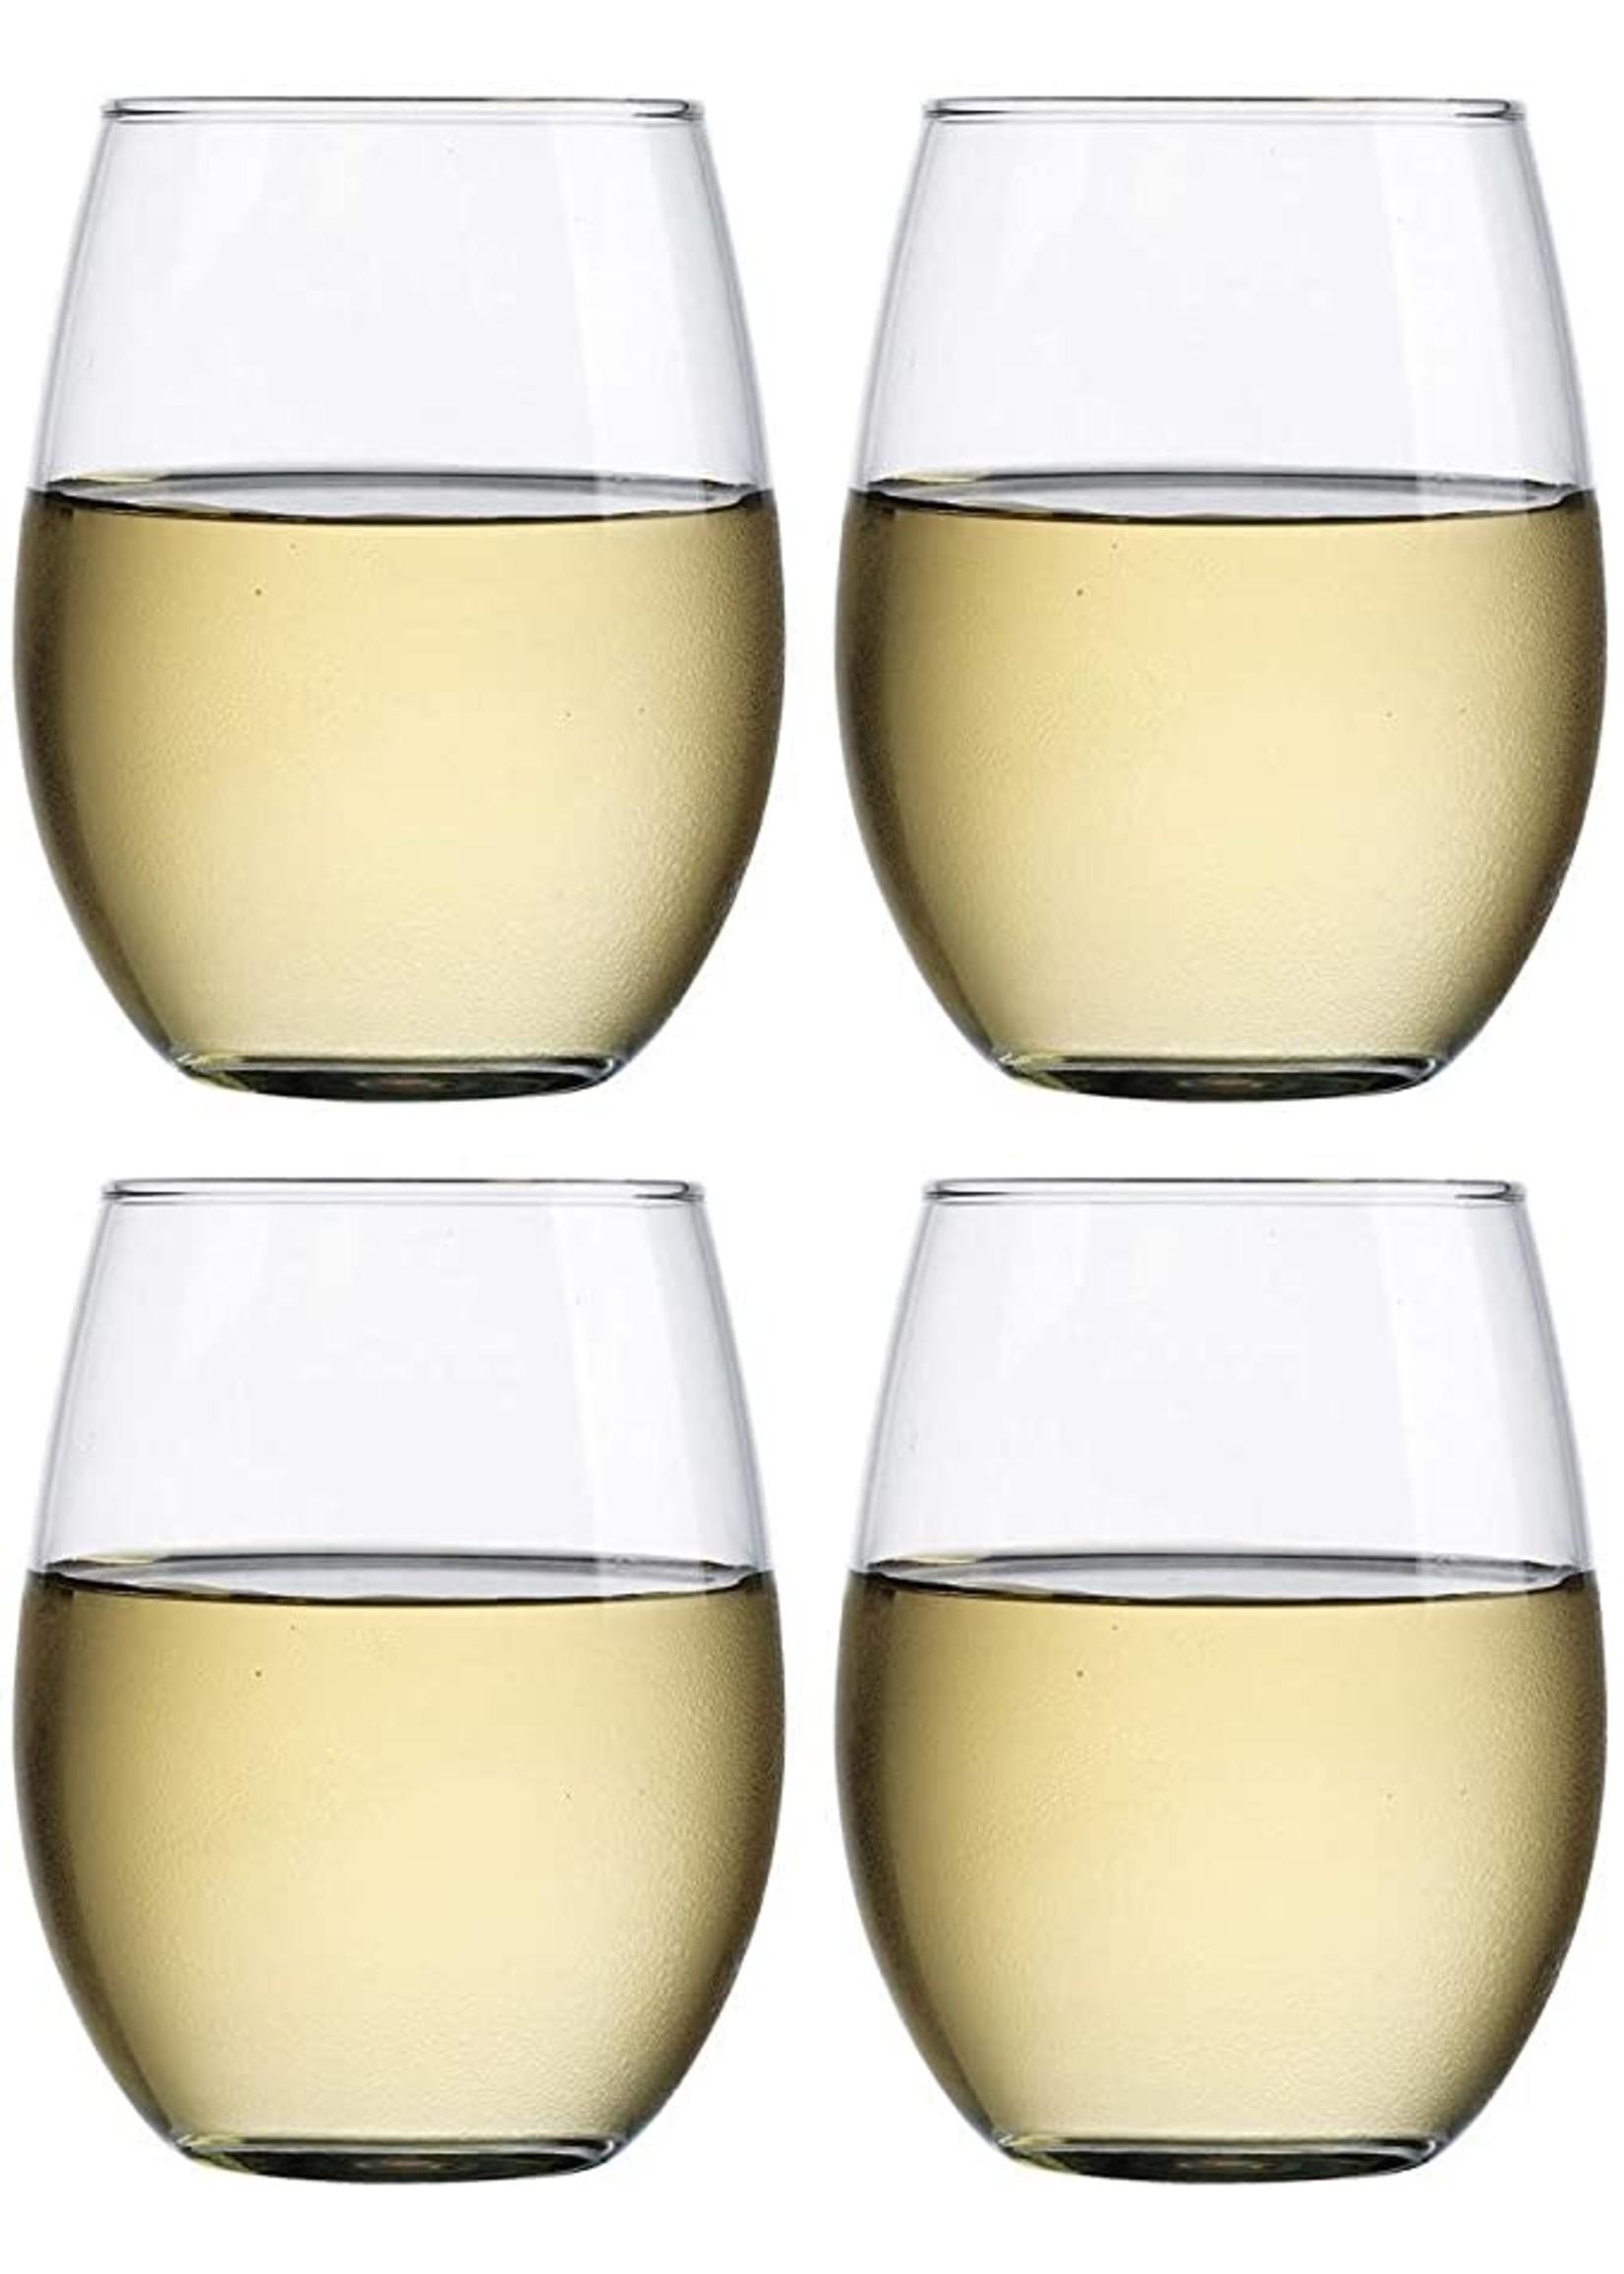 Stemless Wine Glasses 15oz - Set of 4